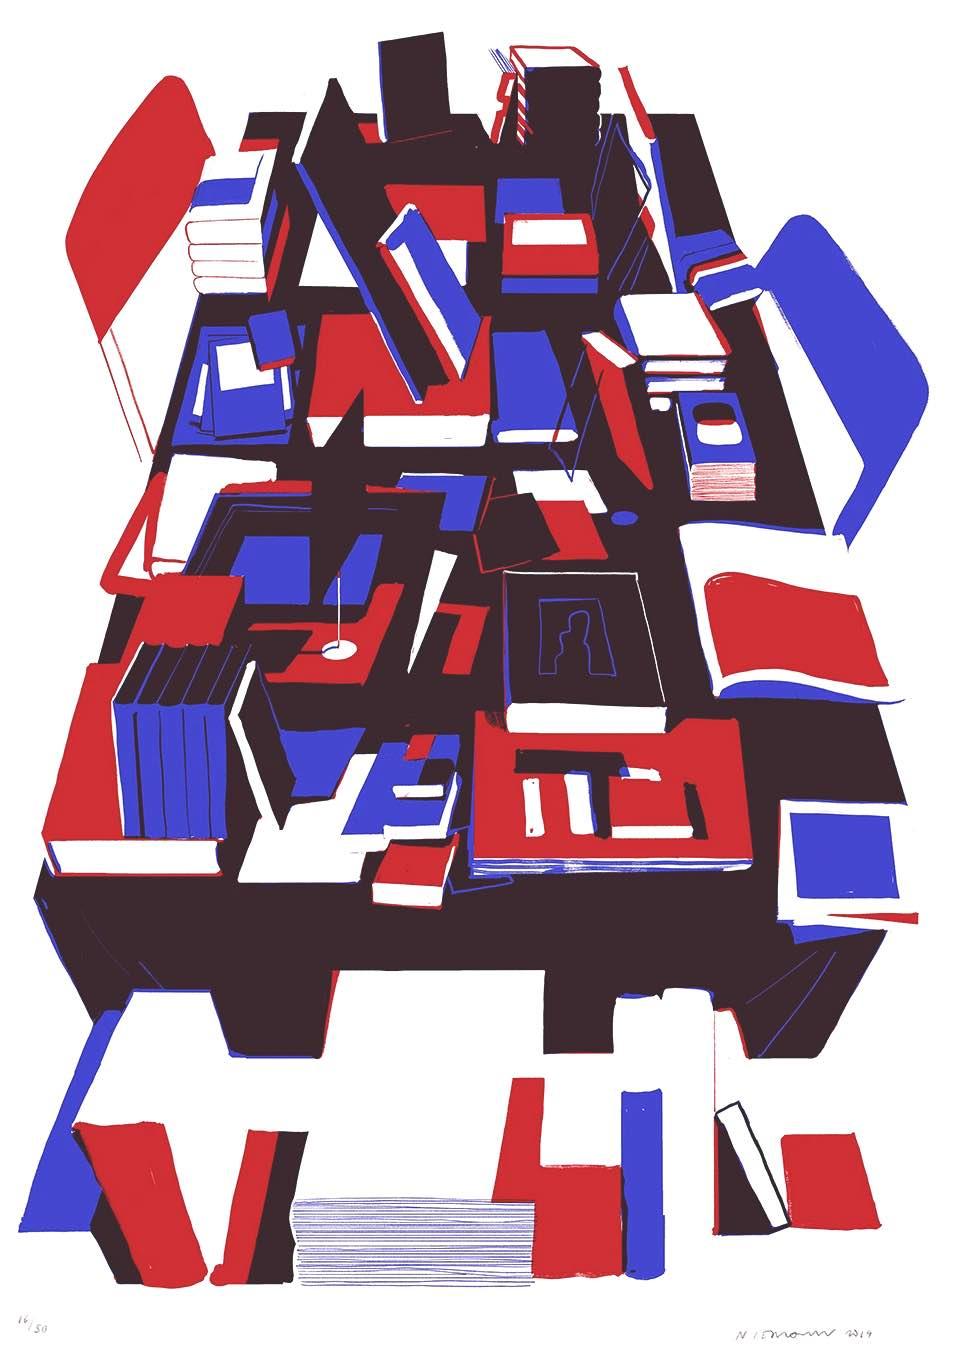 Christoph Niemann art, books on a table